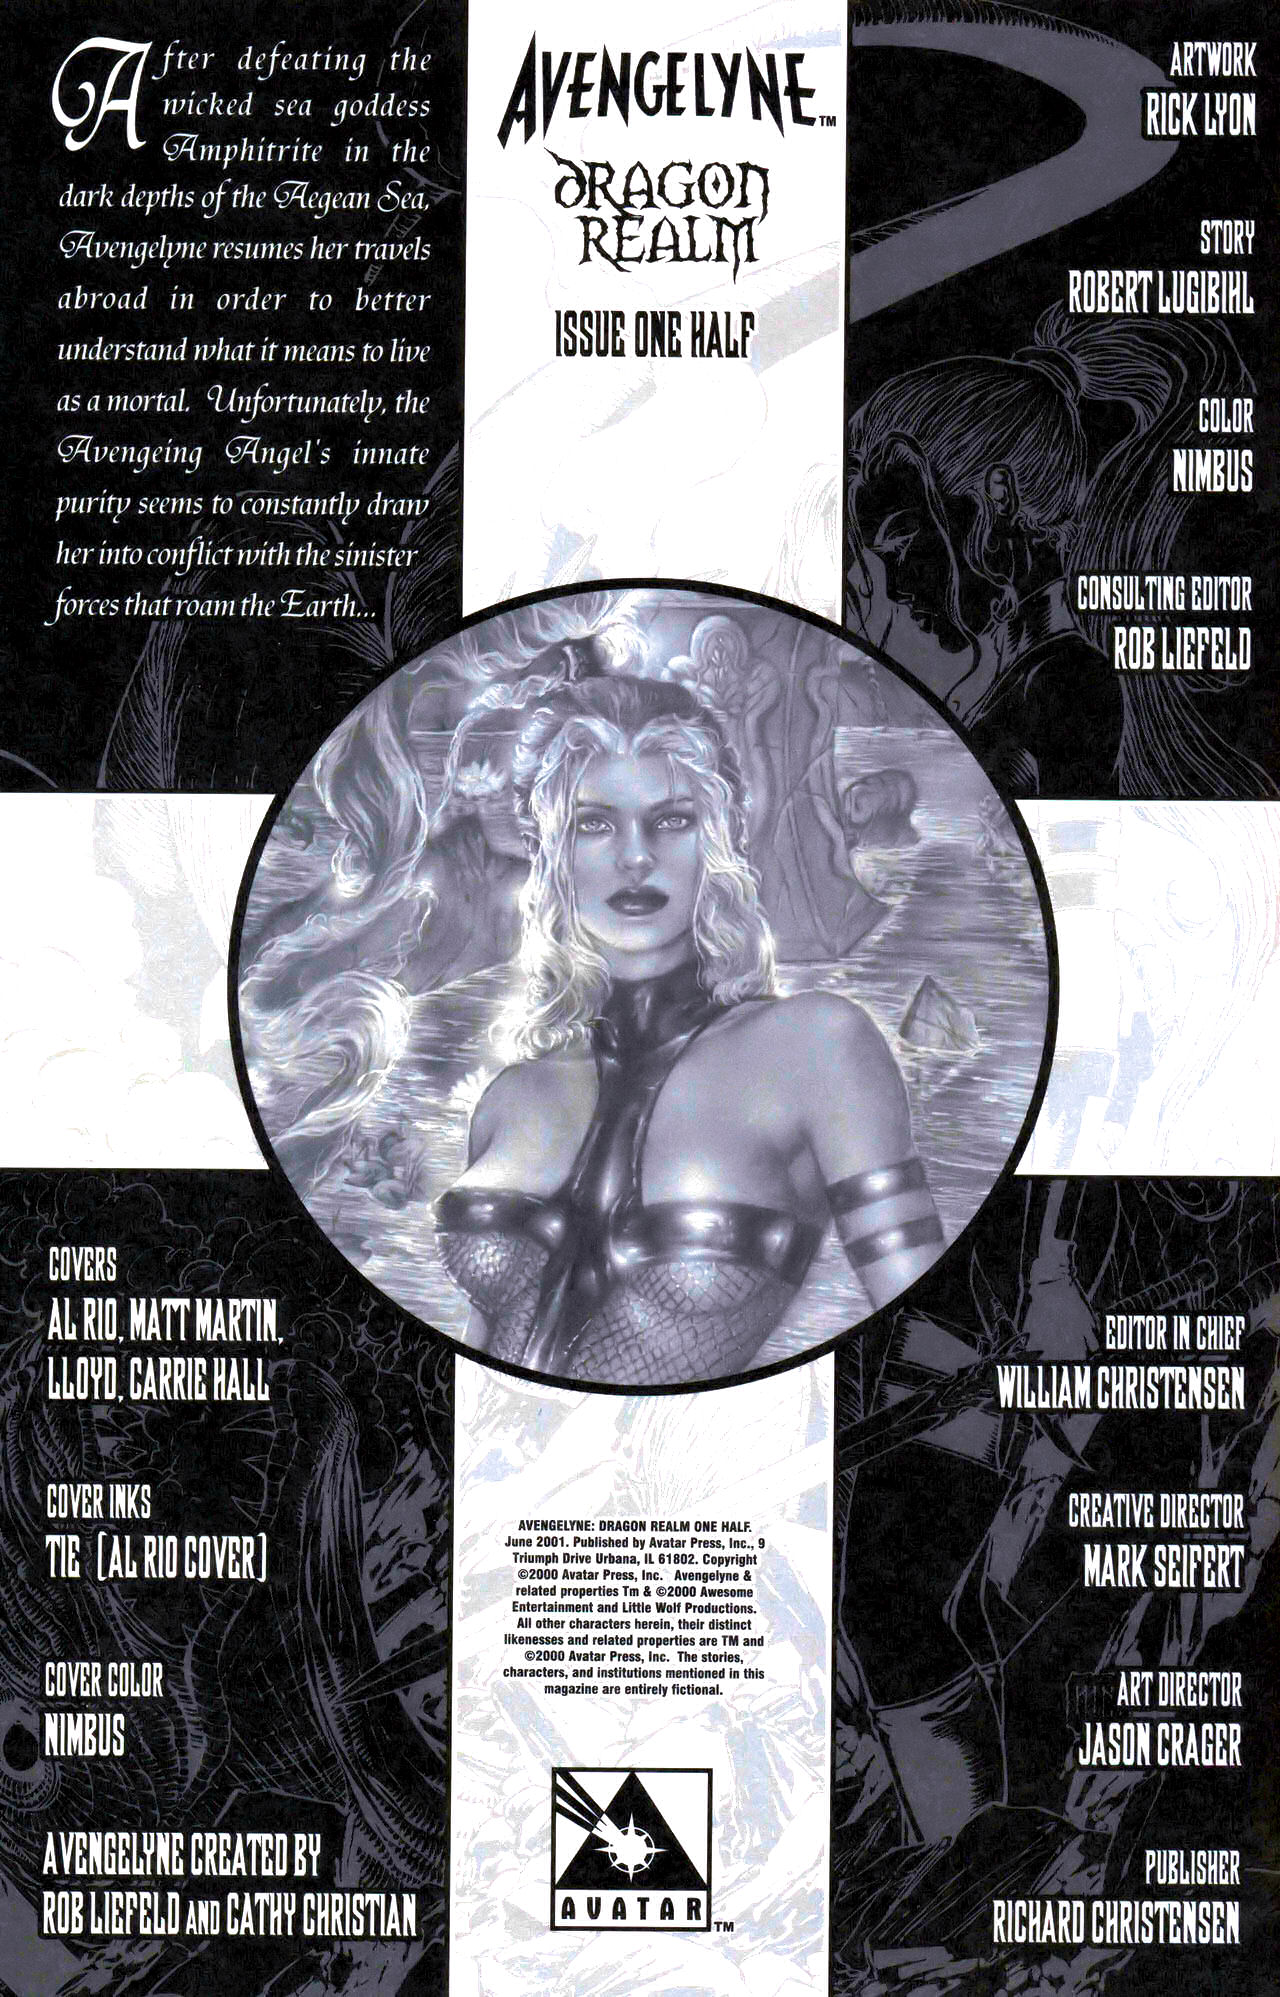 Read online Avengelyne: Dragon Realm comic -  Issue #0.5 - 7